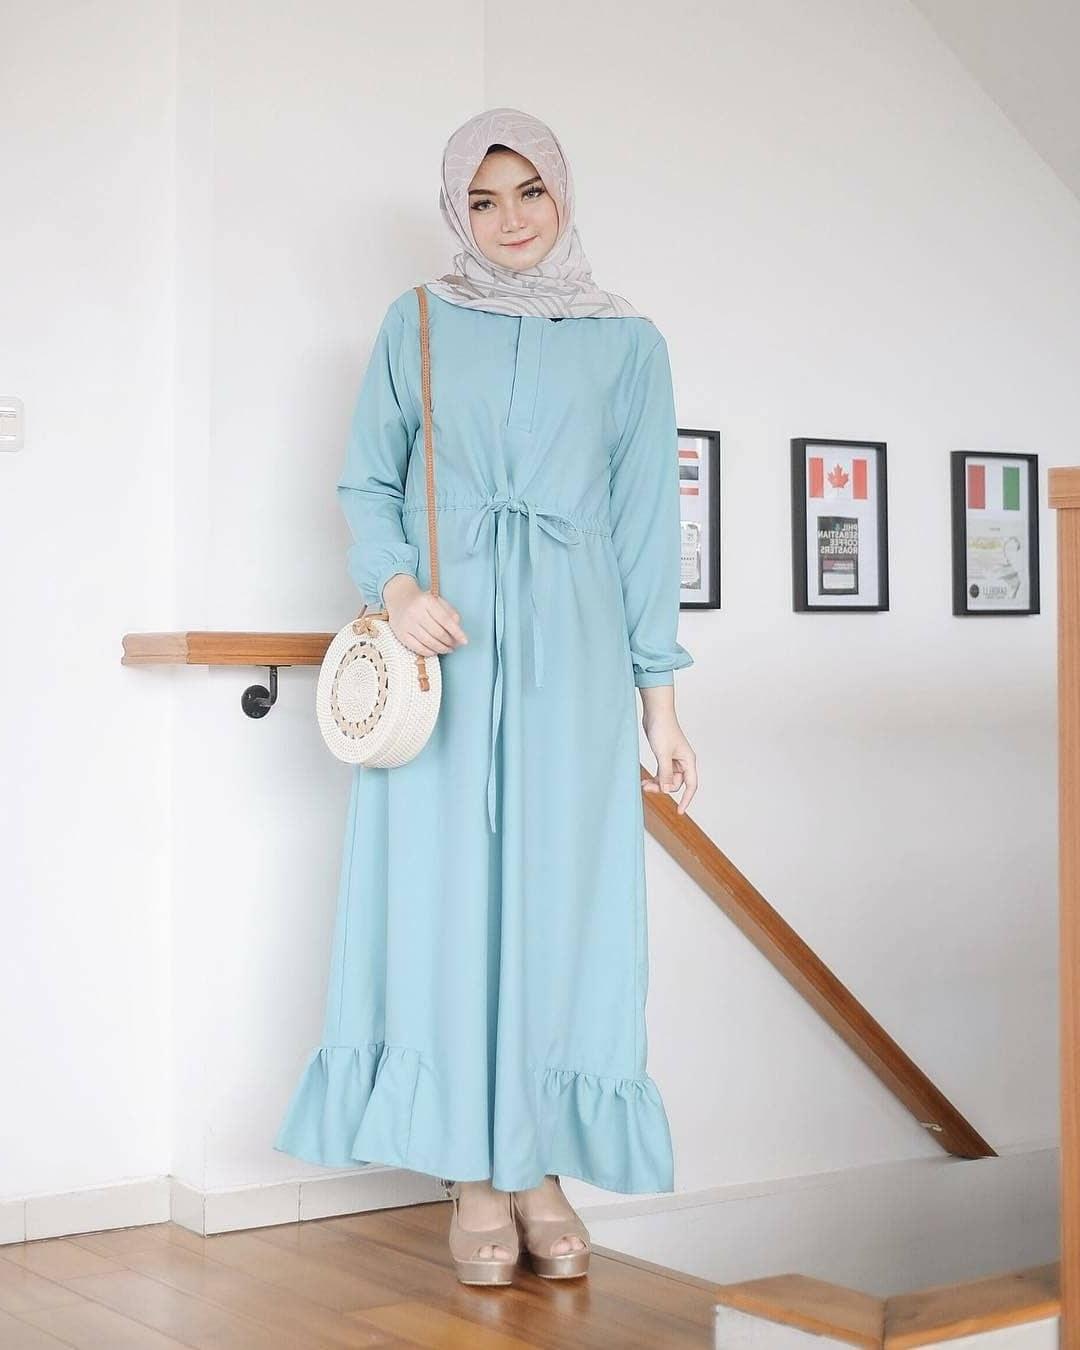 Inspirasi Model Baju Lebaran Anak Perempuan 2018 Dddy Tren Busana Muslim Terbaru Untuk Merayakan Hari Raya Yang